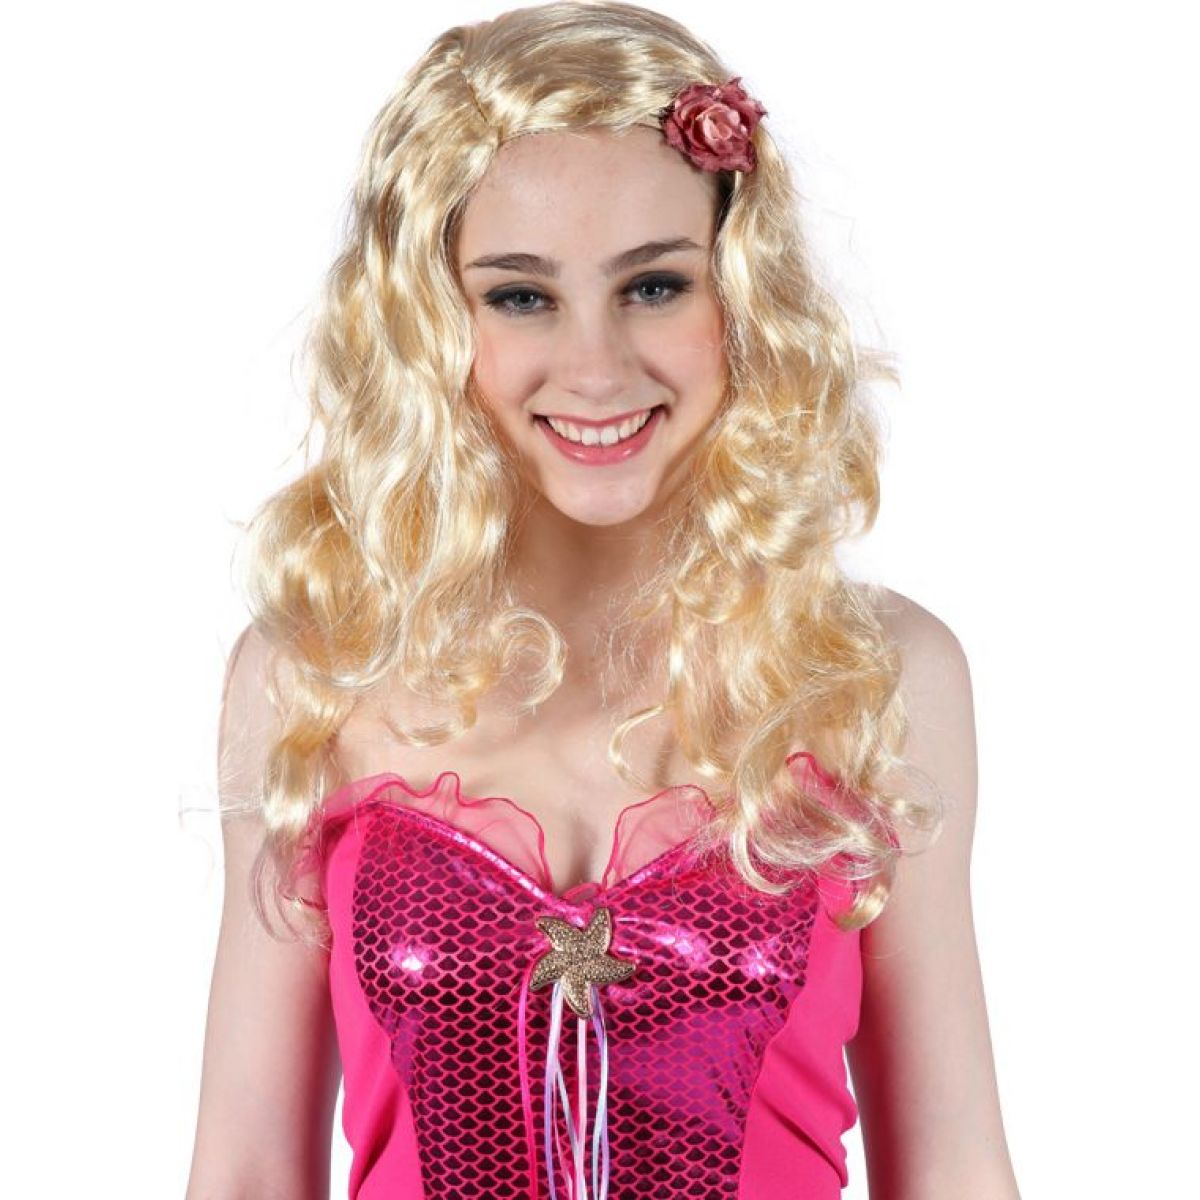 Hm Studio Parochňa blond s ružou